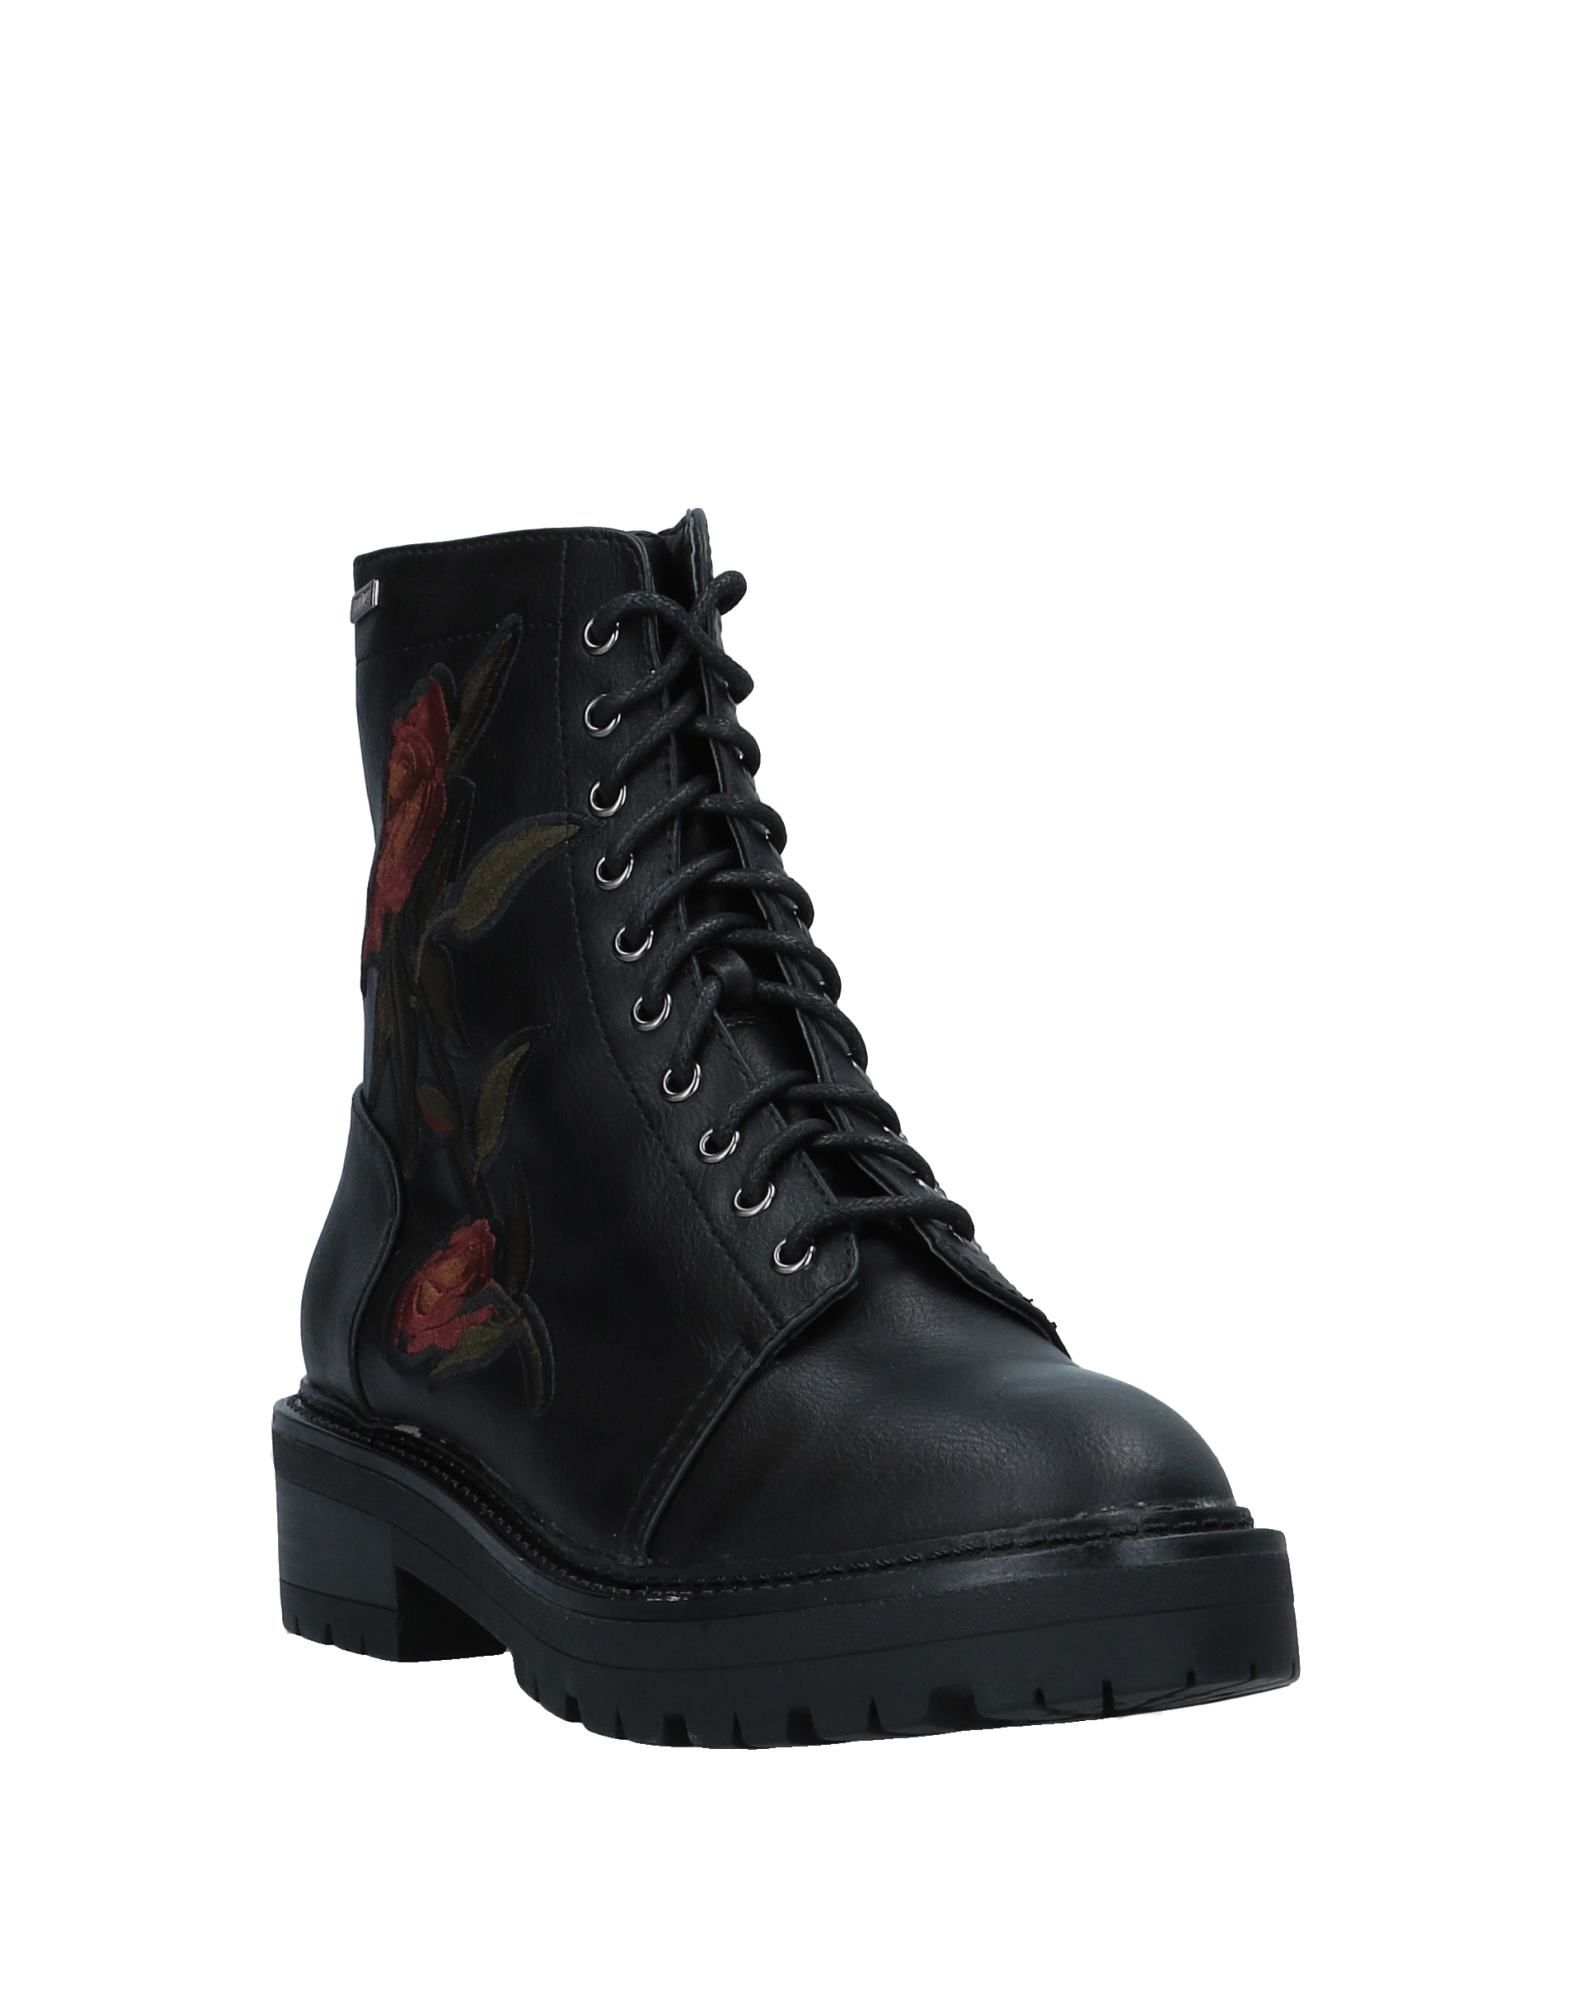 Chaussures Noir Bottine Bottines Femme Mtng nOwUqzxwB